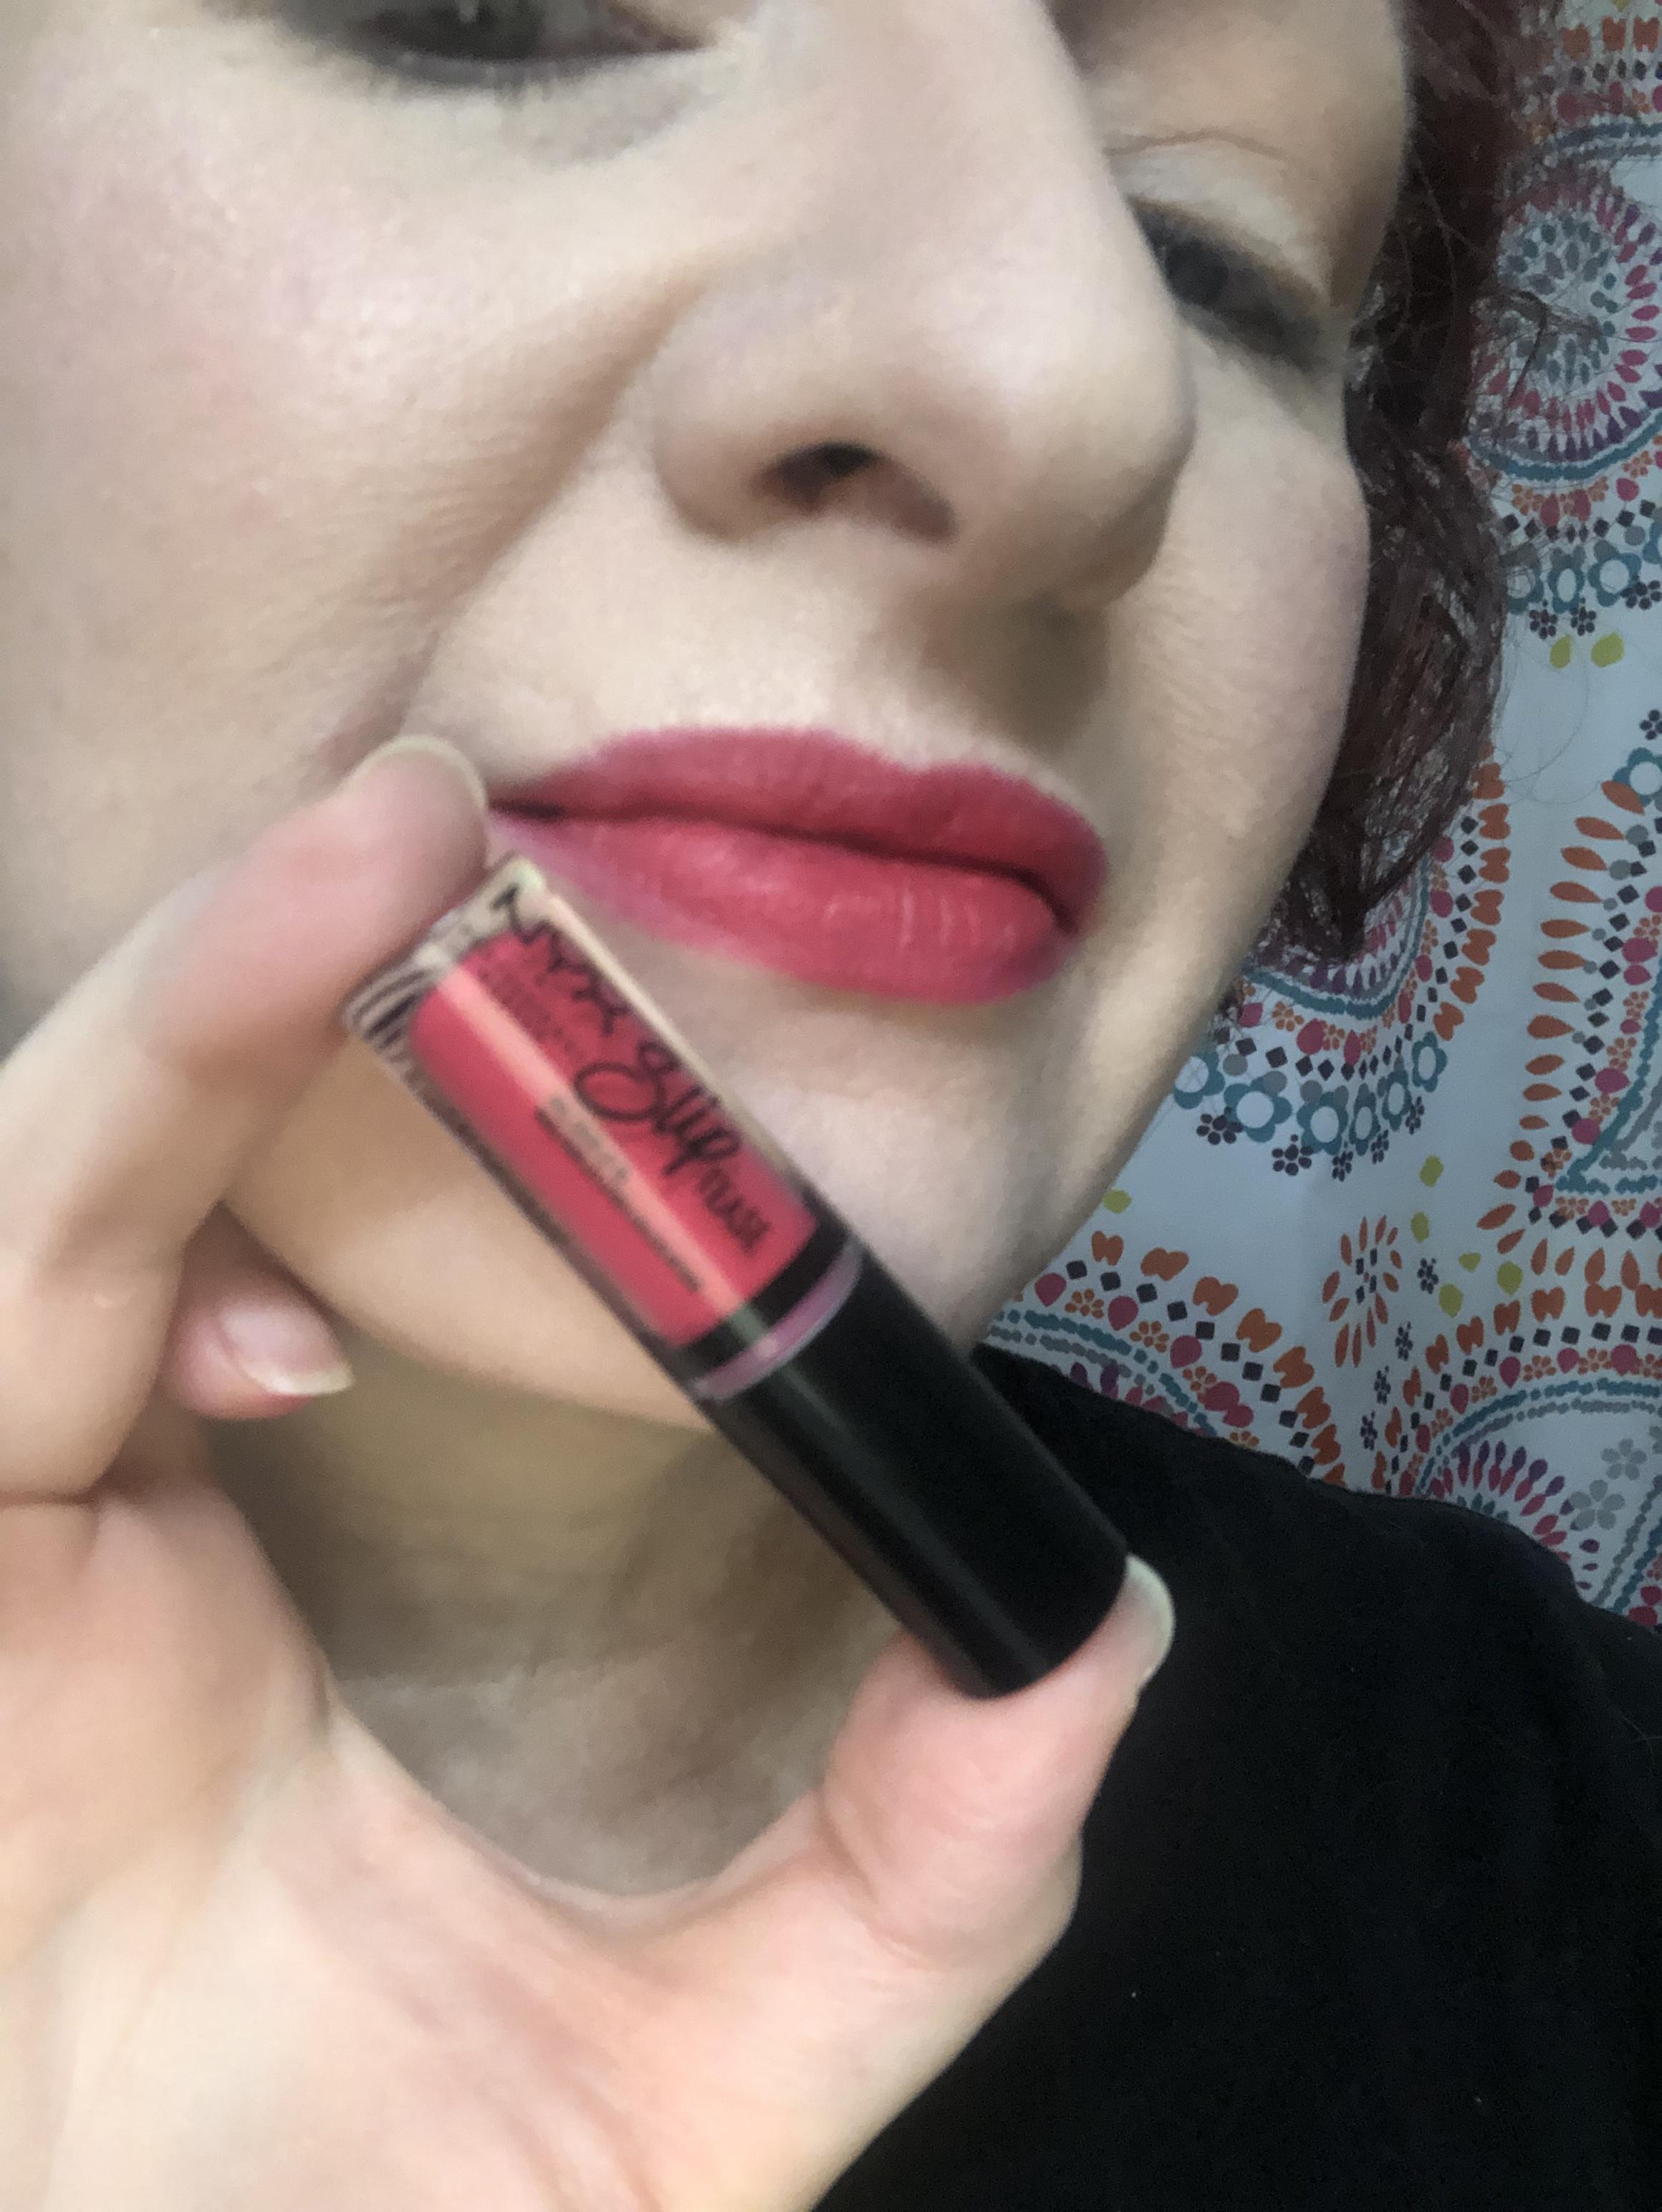 Nyx Sweet Chateau Slip Tease Lip Vault Strawberry Shake Swatch